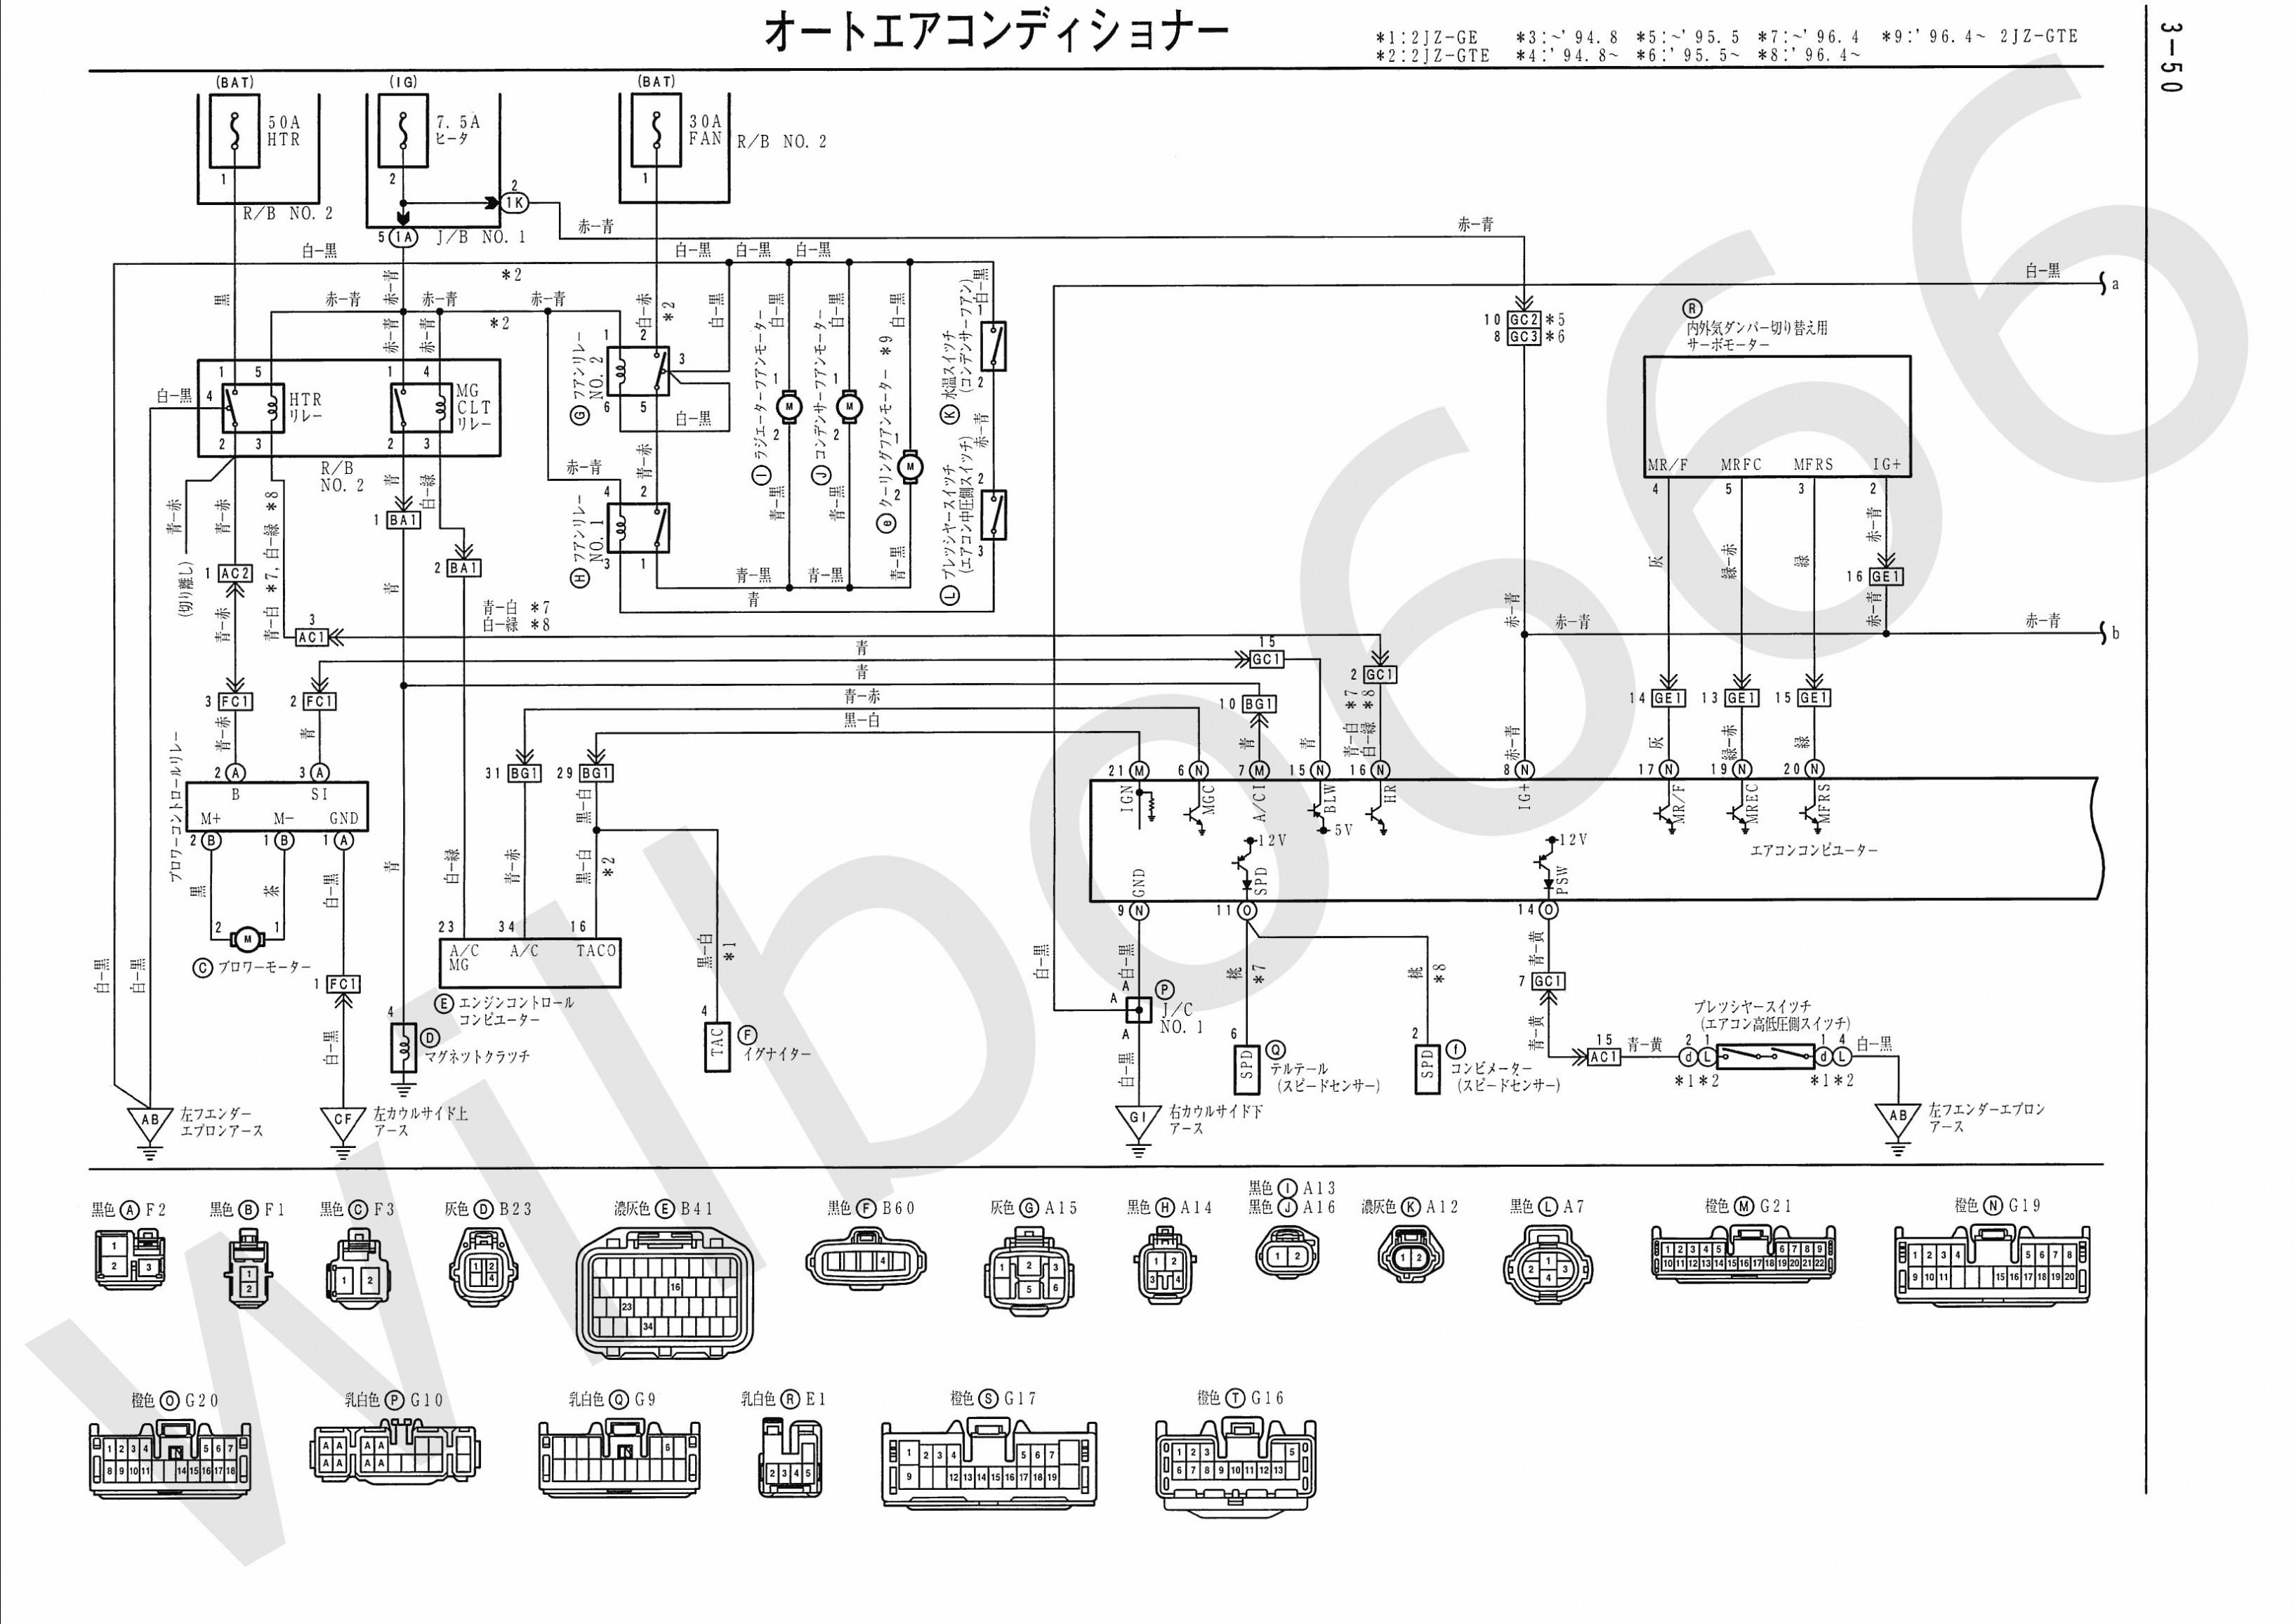 2001 honda civic lx engine diagram 1998 civic engine diagram layout wiring  diagrams • of 2001